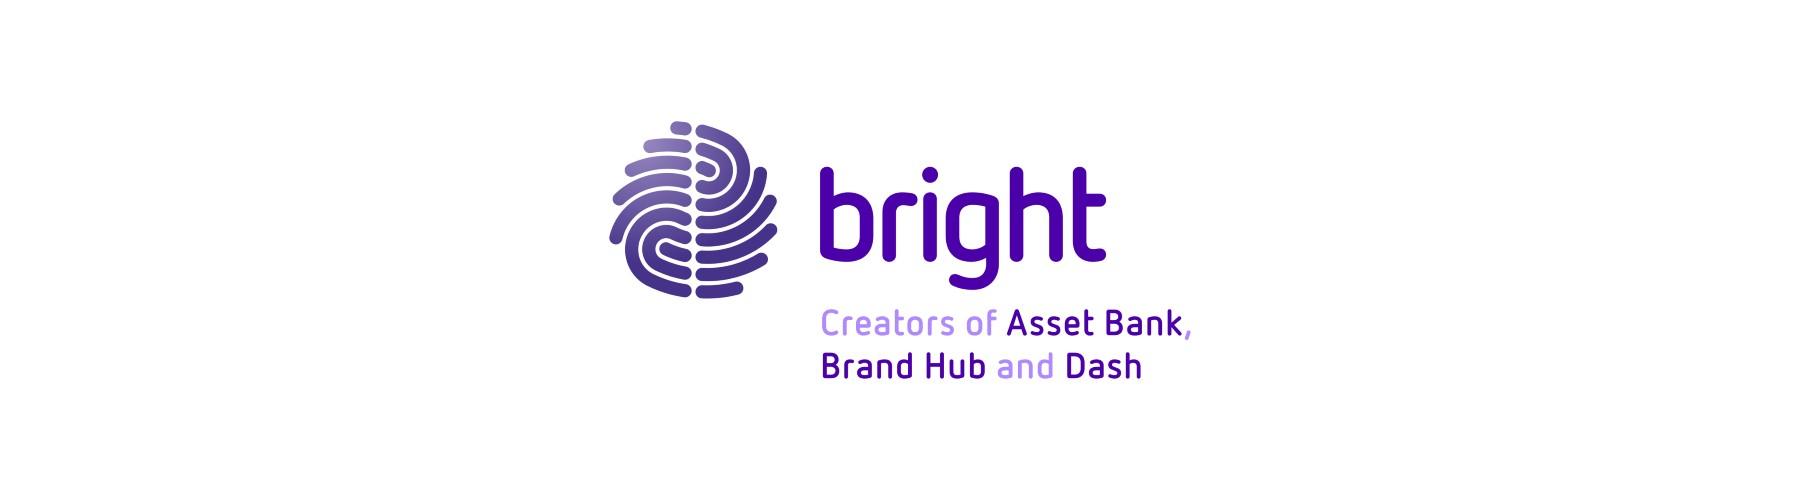 Asset Bank | LinkedIn